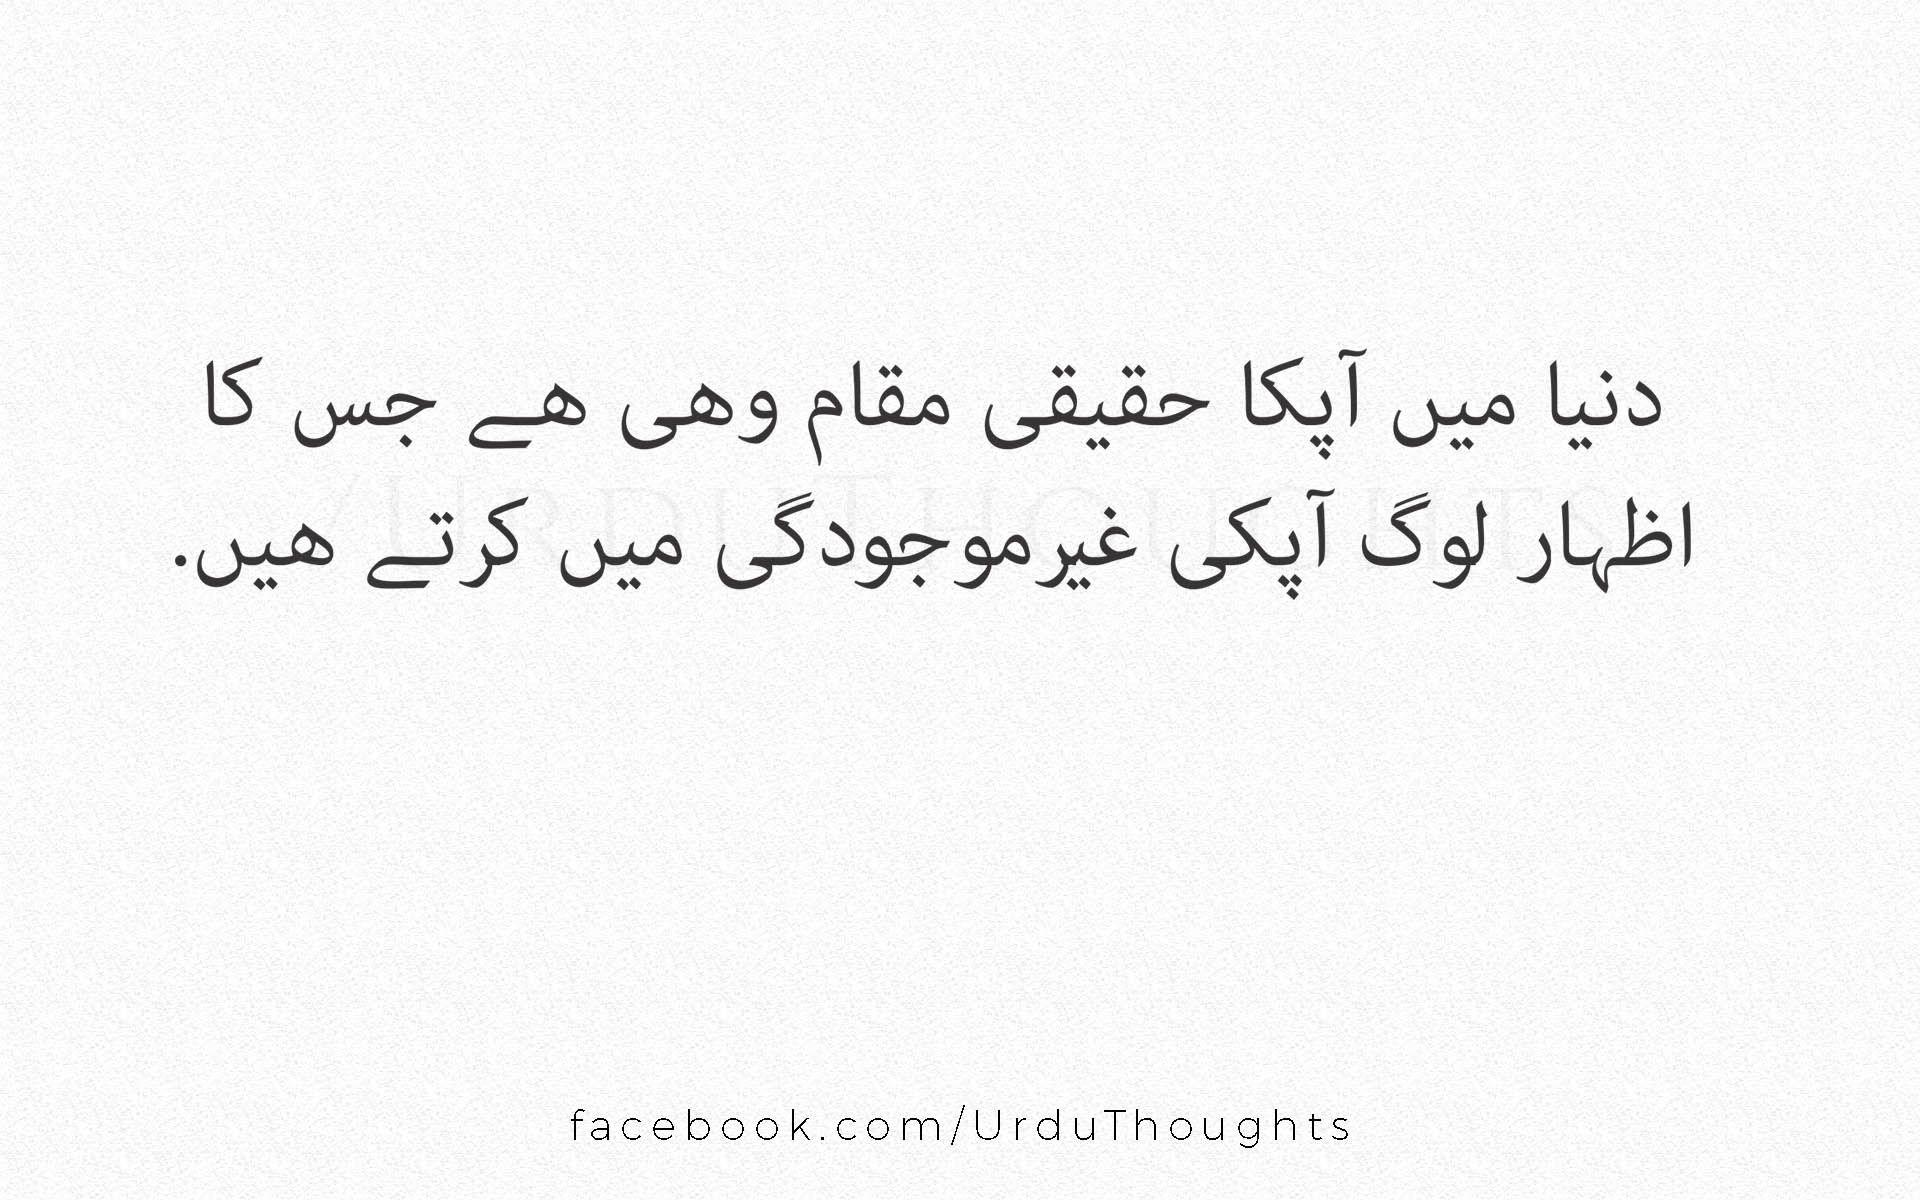 Urdu Quotes Black Background Images - Latest Urdu Novels Lines